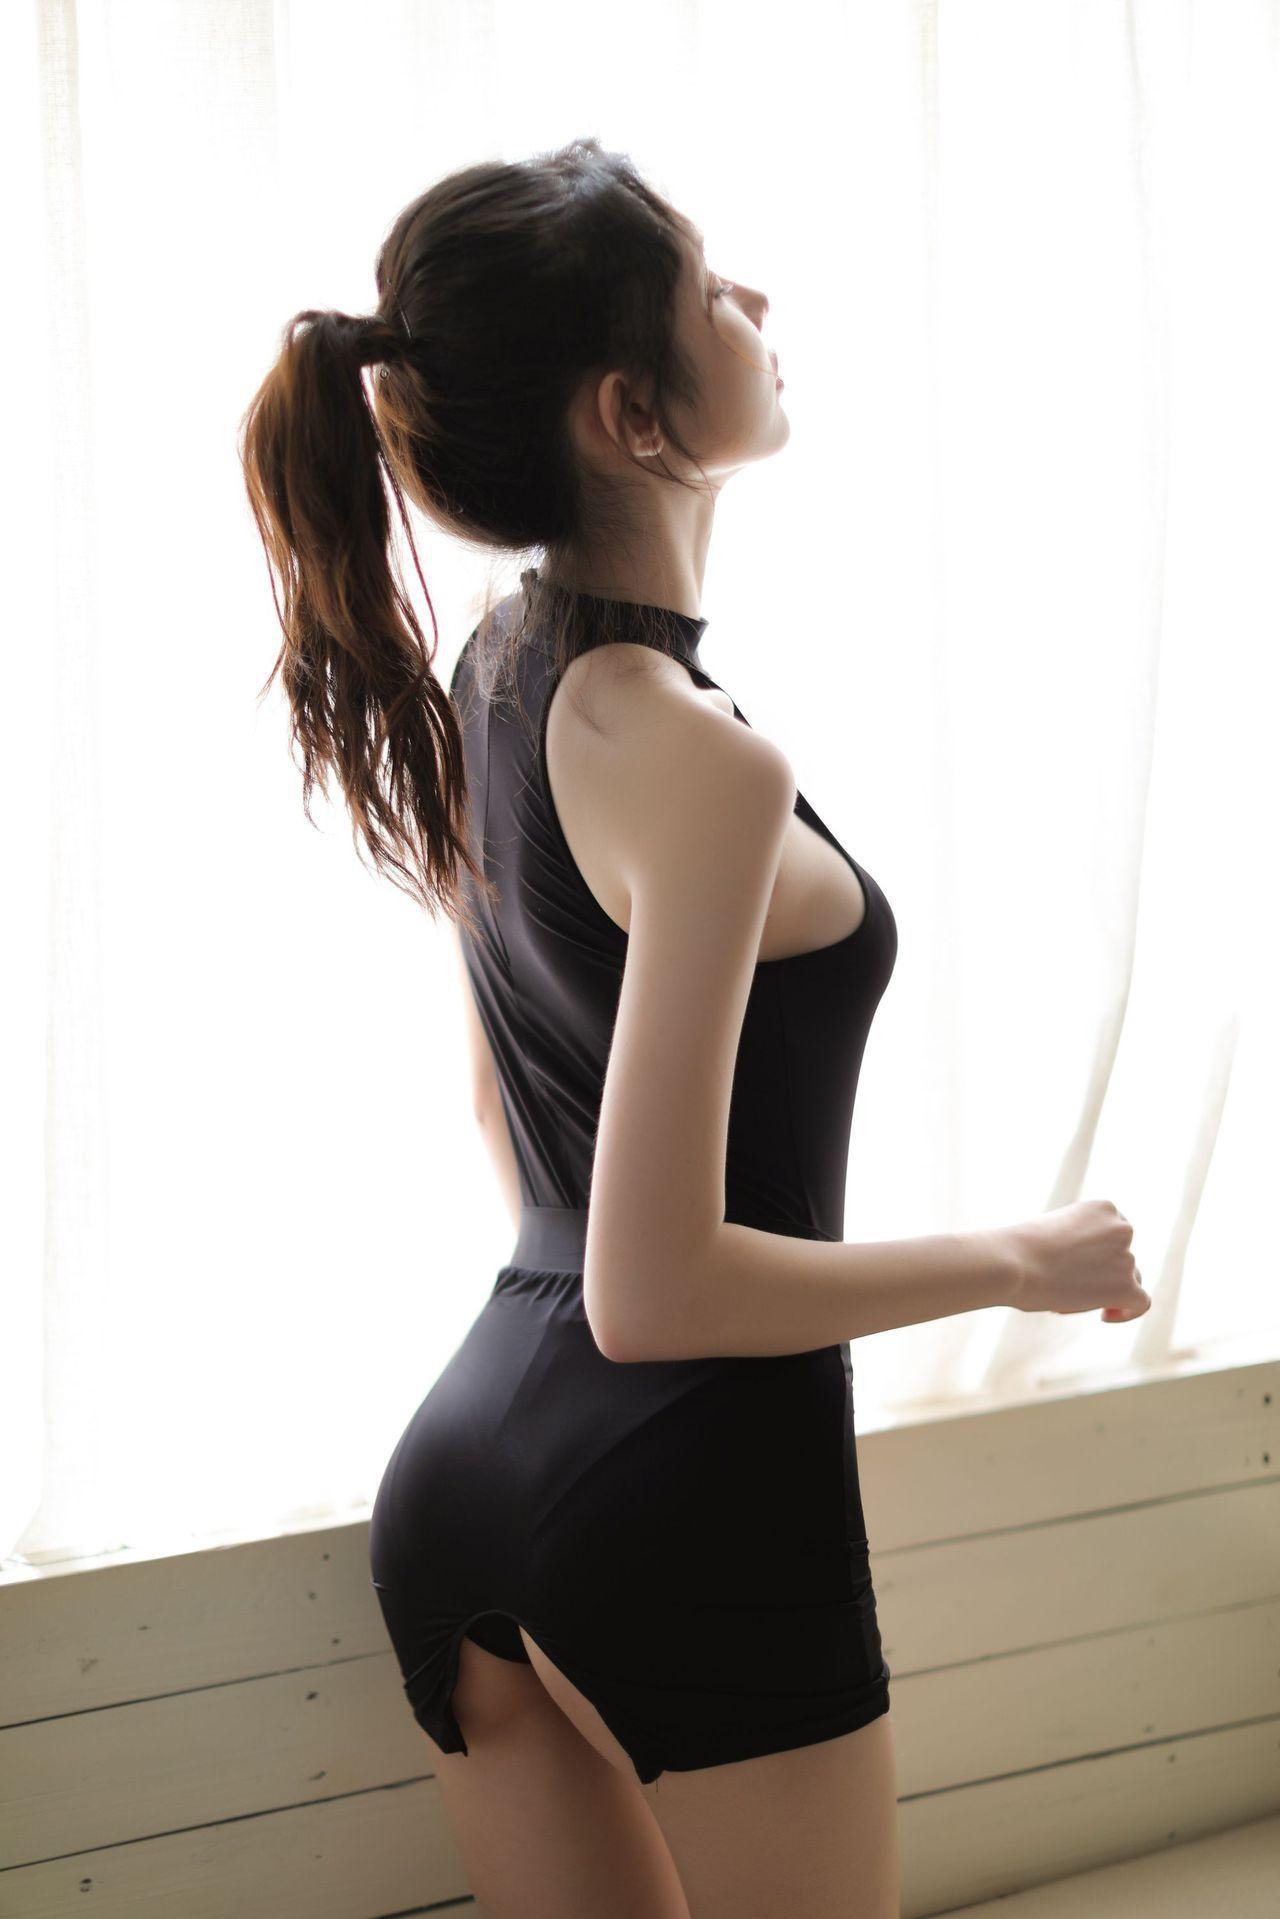 PgjhJ Shi ropa interior atractiva meiza brillante elástica leche de seda seda de la leche mono miniskirtminiskirt Minifalda-campo abierto Secretario equipar 9069